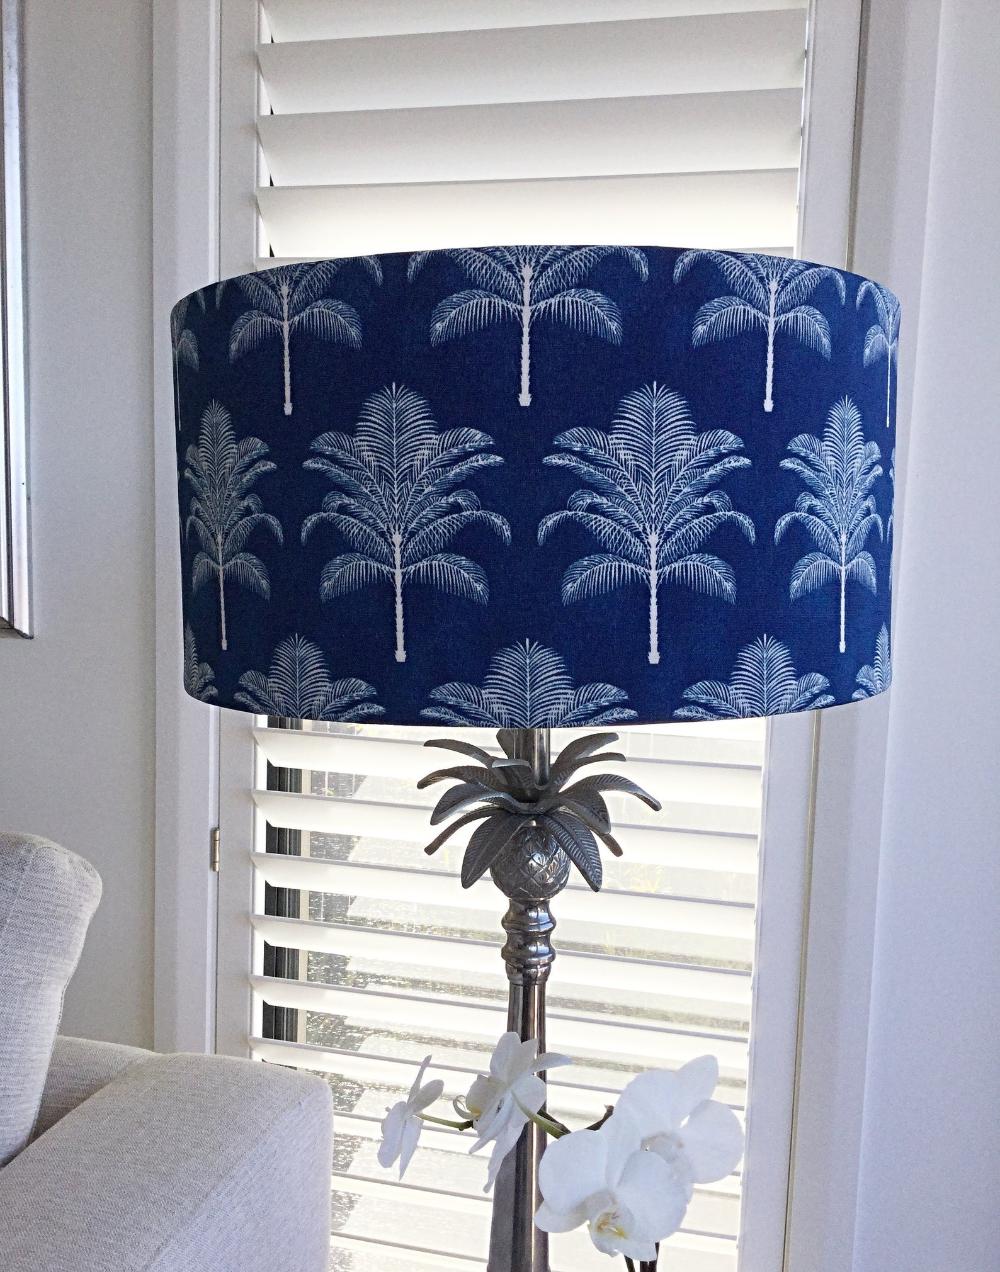 Lampshade Palm Life Coastal Decor Lamp Shade Beach Decor Tropical Decor Barrel Lampshade In 2020 Lamp Shades Coastal Decorating Outdoor Cushion Covers